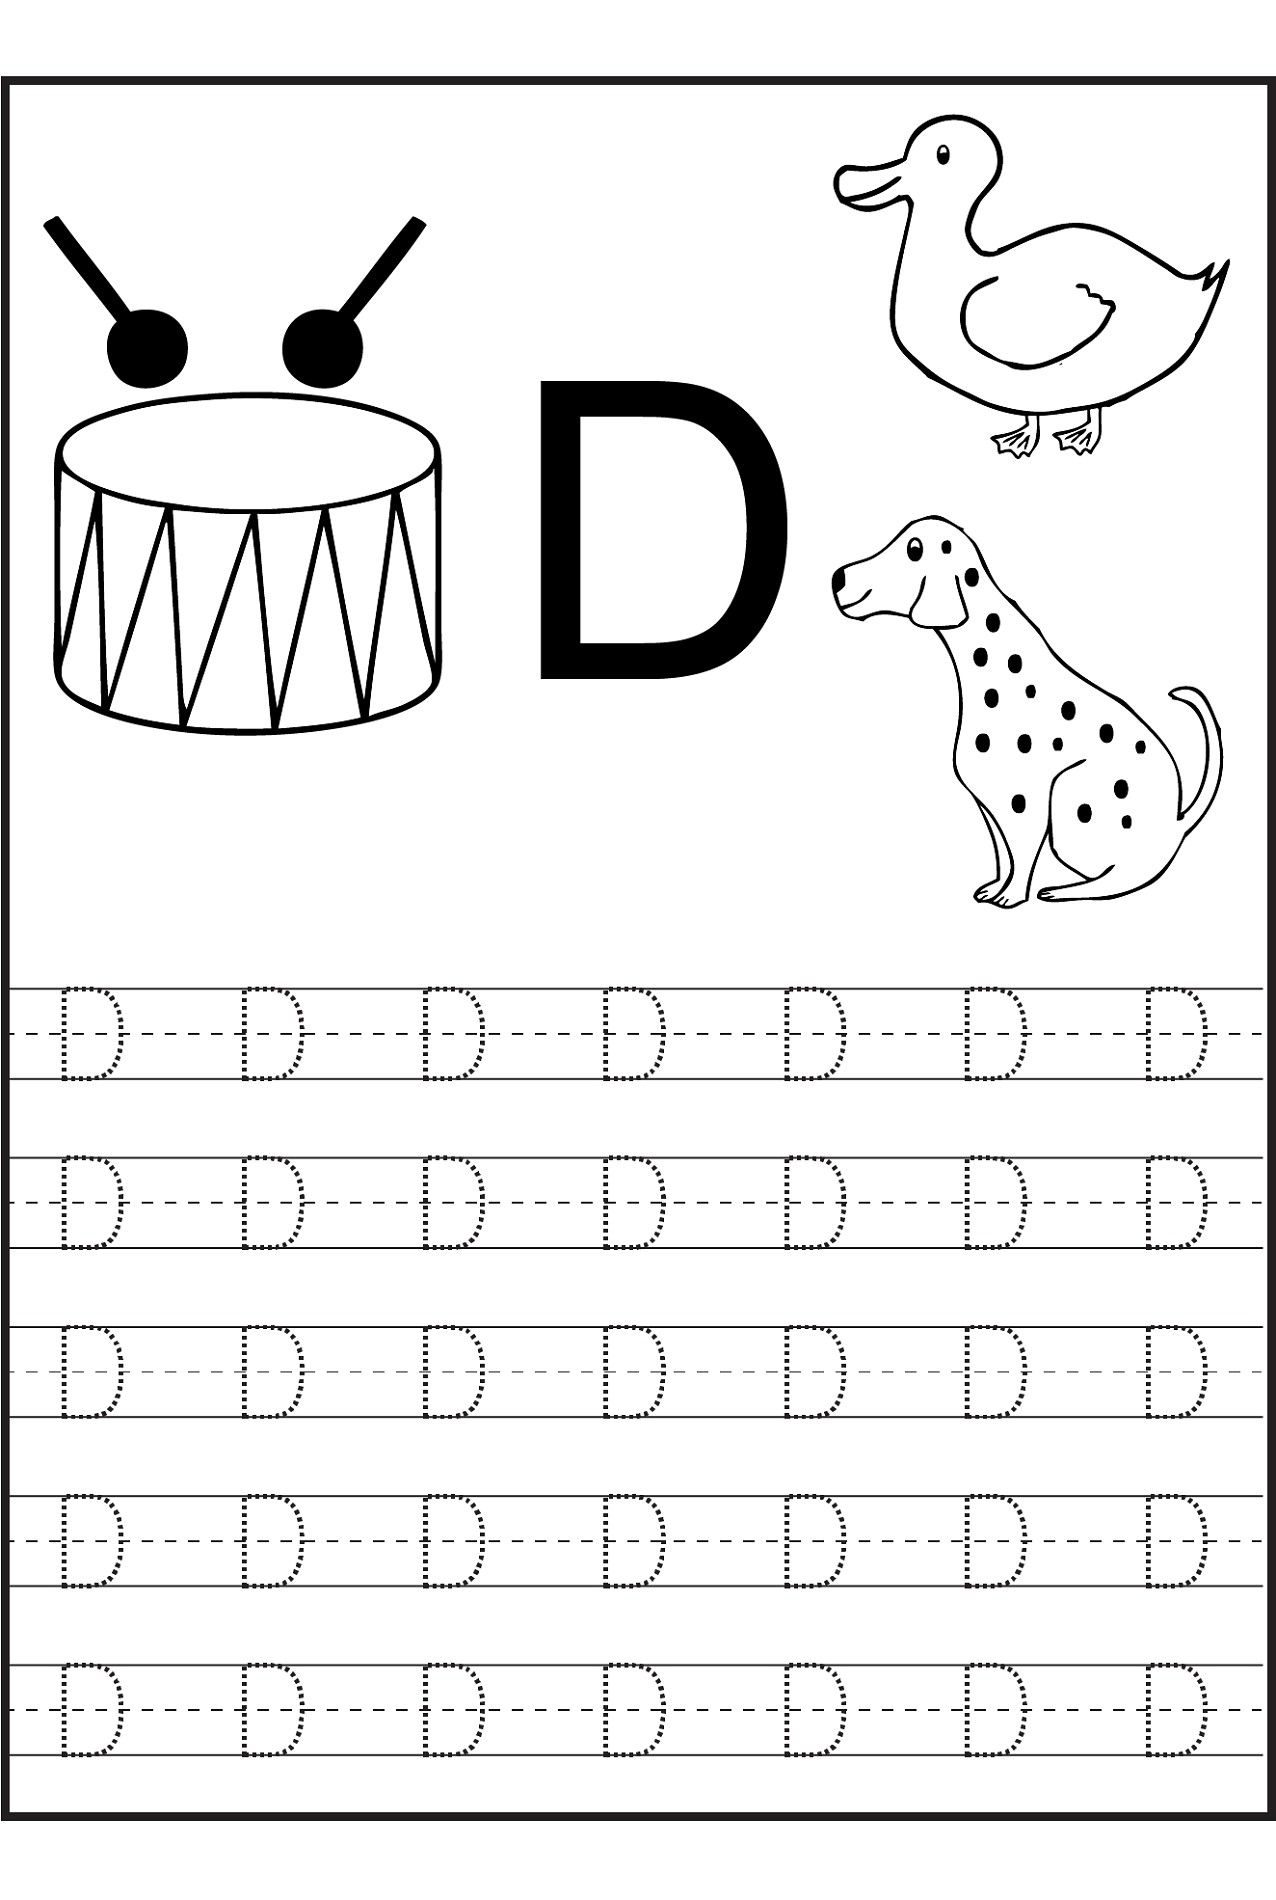 4 Worksheet Alphabet Worksheet For Nursery Class Trace Letter D Worksheets Activit Alphabet Tracing Worksheets Letter D Worksheet Alphabet Worksheets Preschool